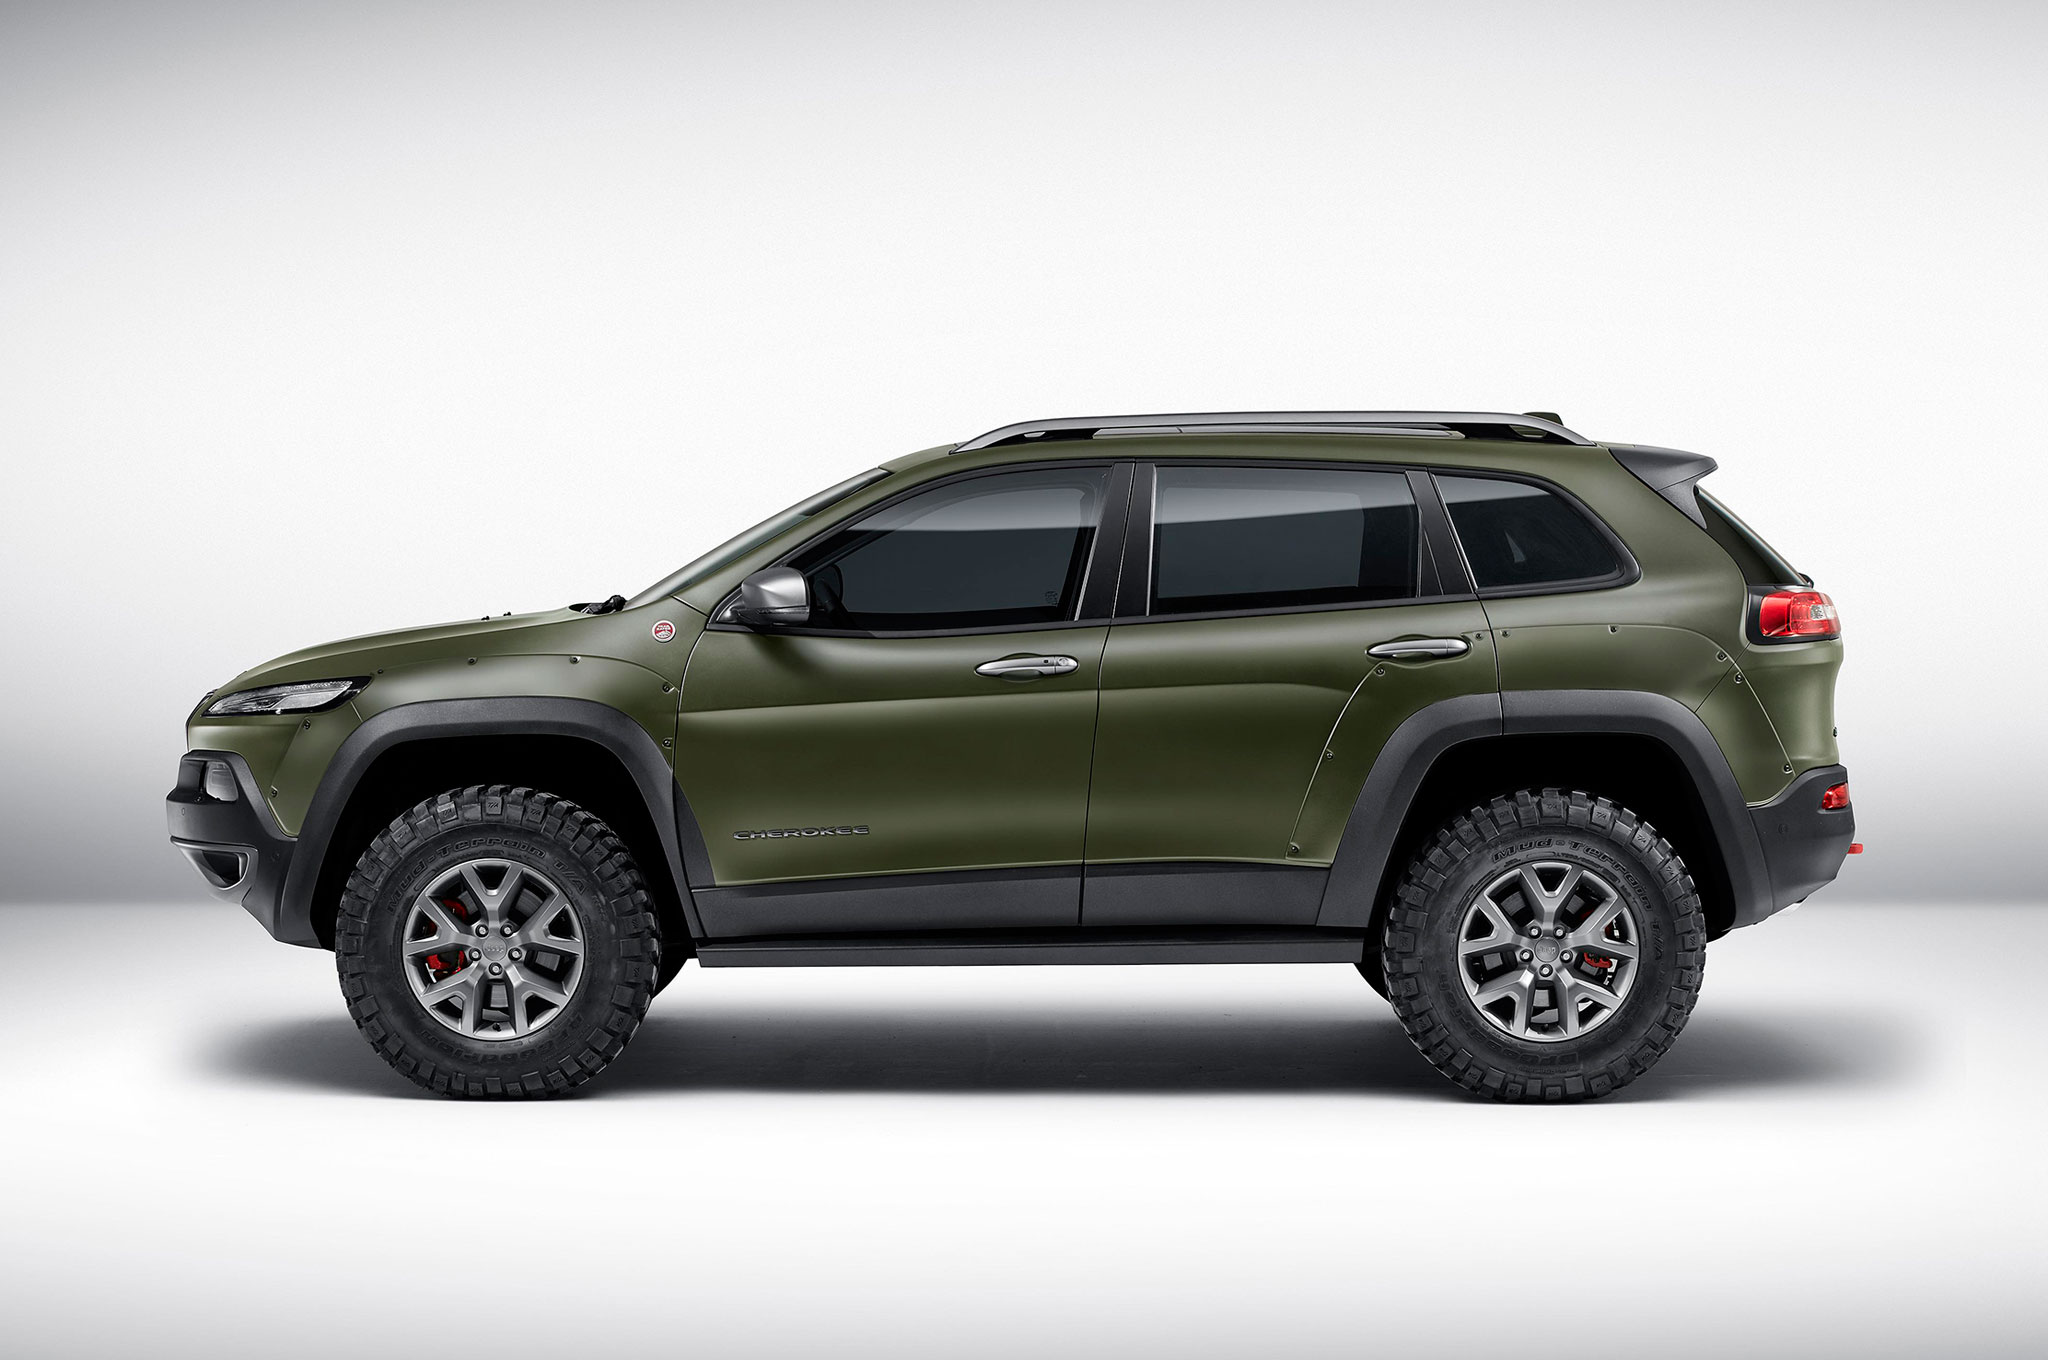 Wrangler Jeep Inside >> Mopar-Tuned Jeep Cherokee, Wrangler, and Renegade Debut in ...